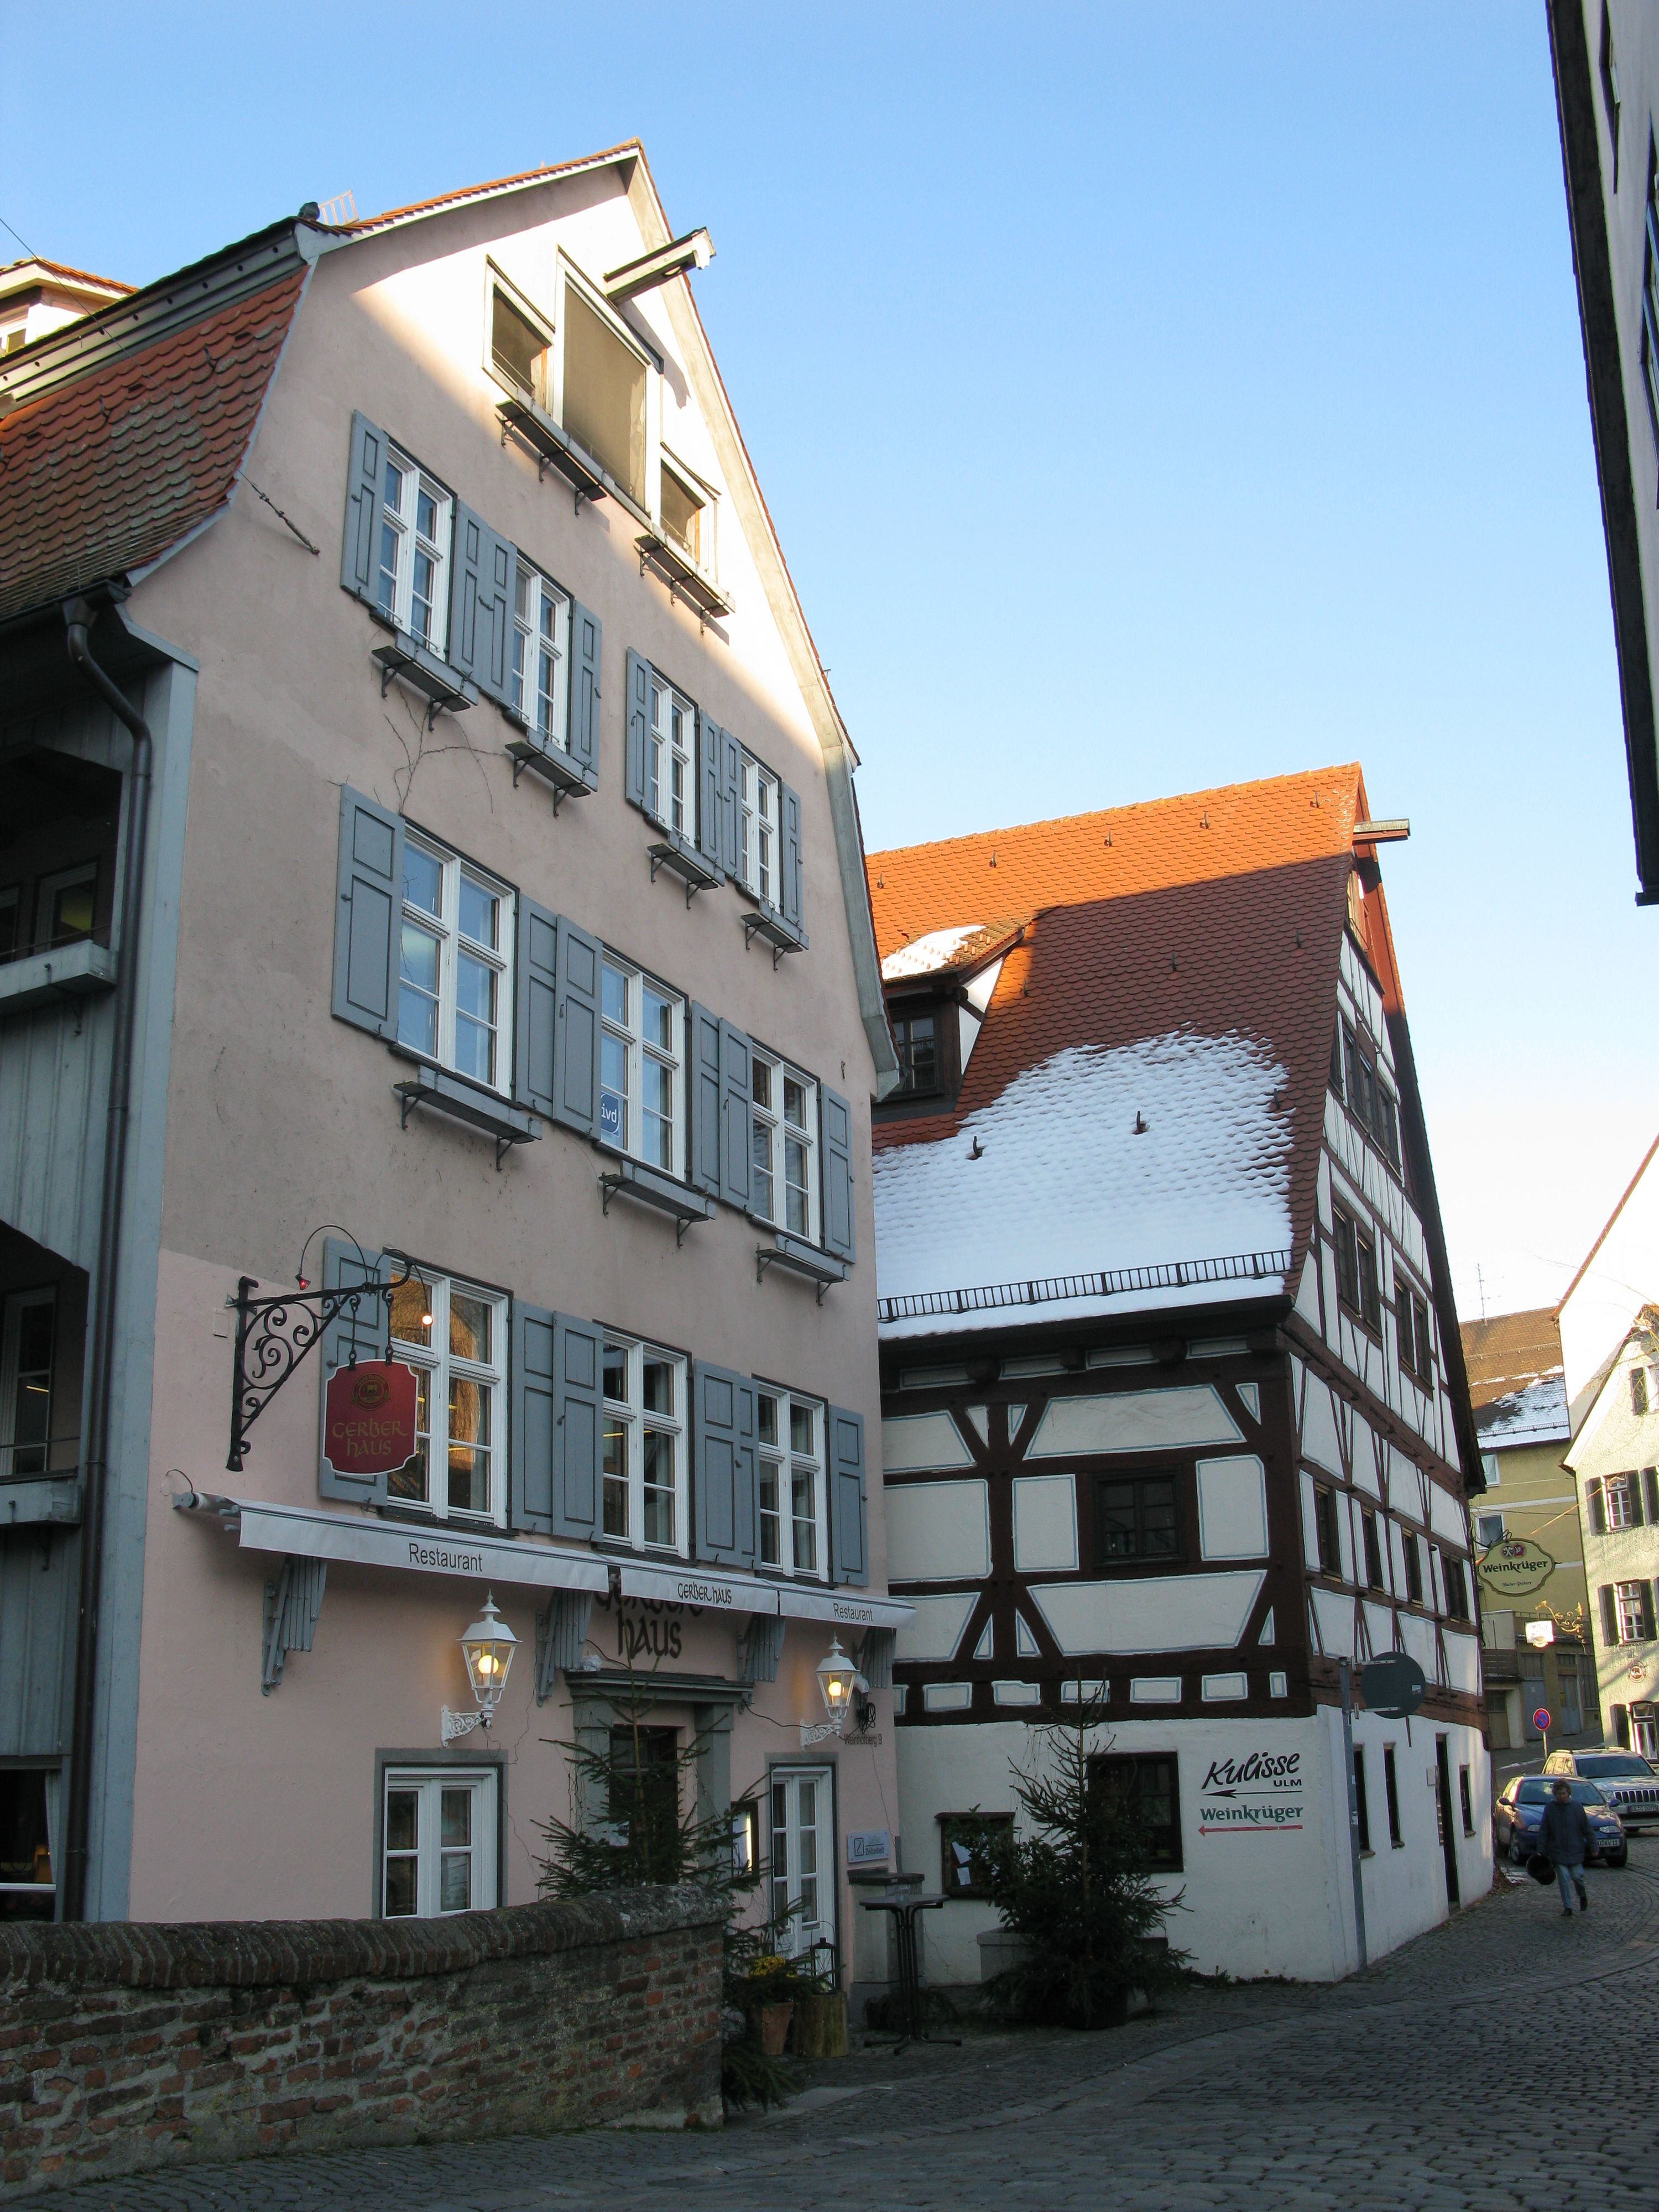 Filefischerviertel Weinhofberg Gerberhaus Ulmjpg